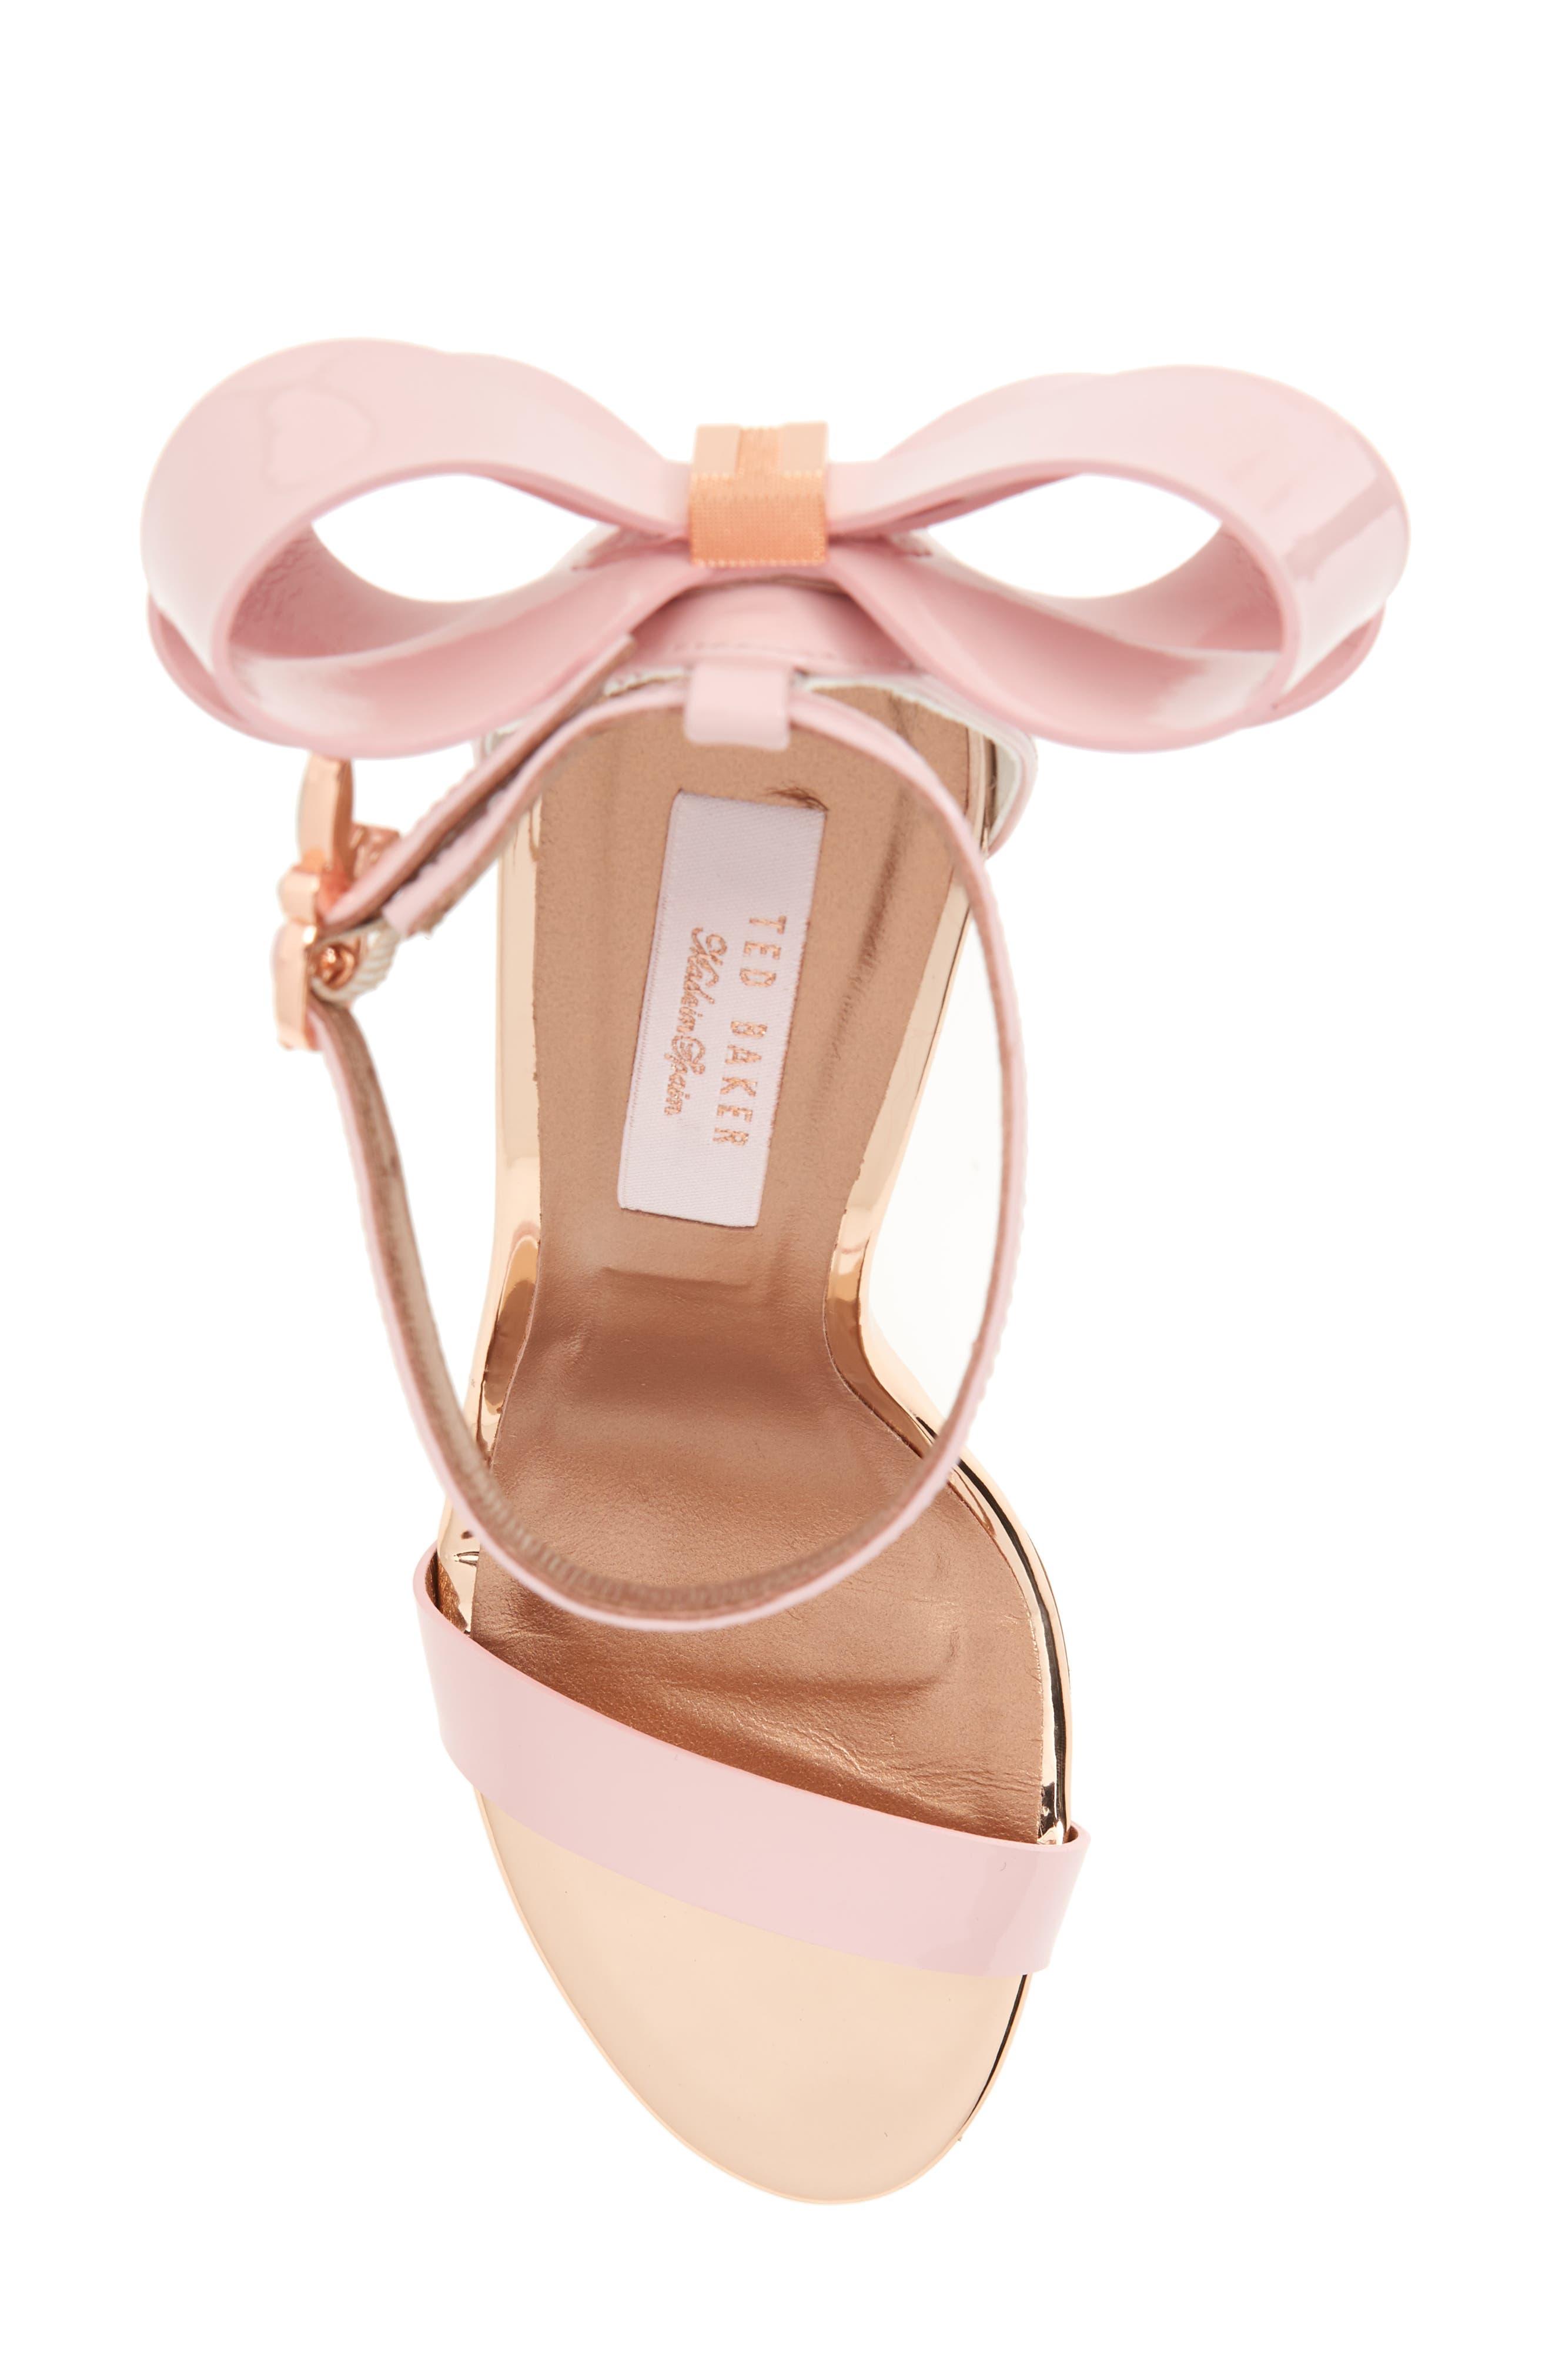 Sandalo Sandal,                             Alternate thumbnail 5, color,                             Light Pink Leather